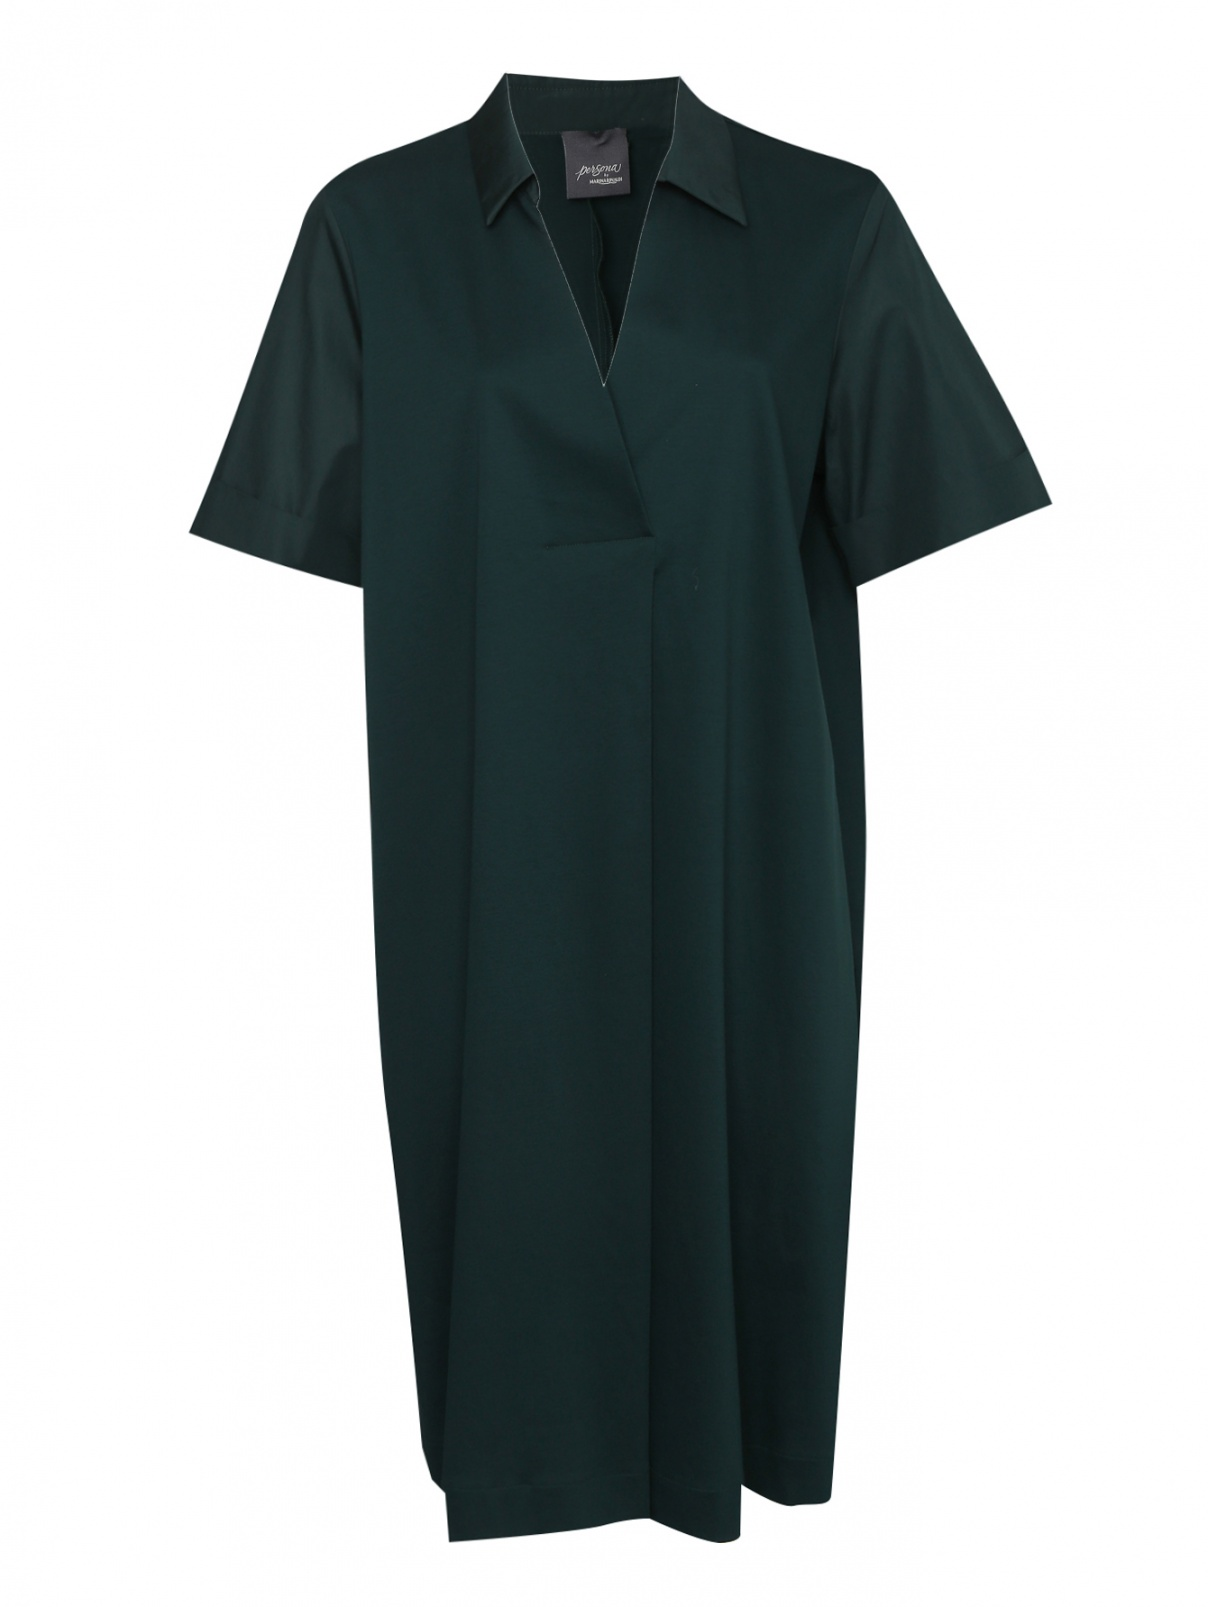 Платье из хлопка с короткими рукавами Persona by Marina Rinaldi  –  Общий вид